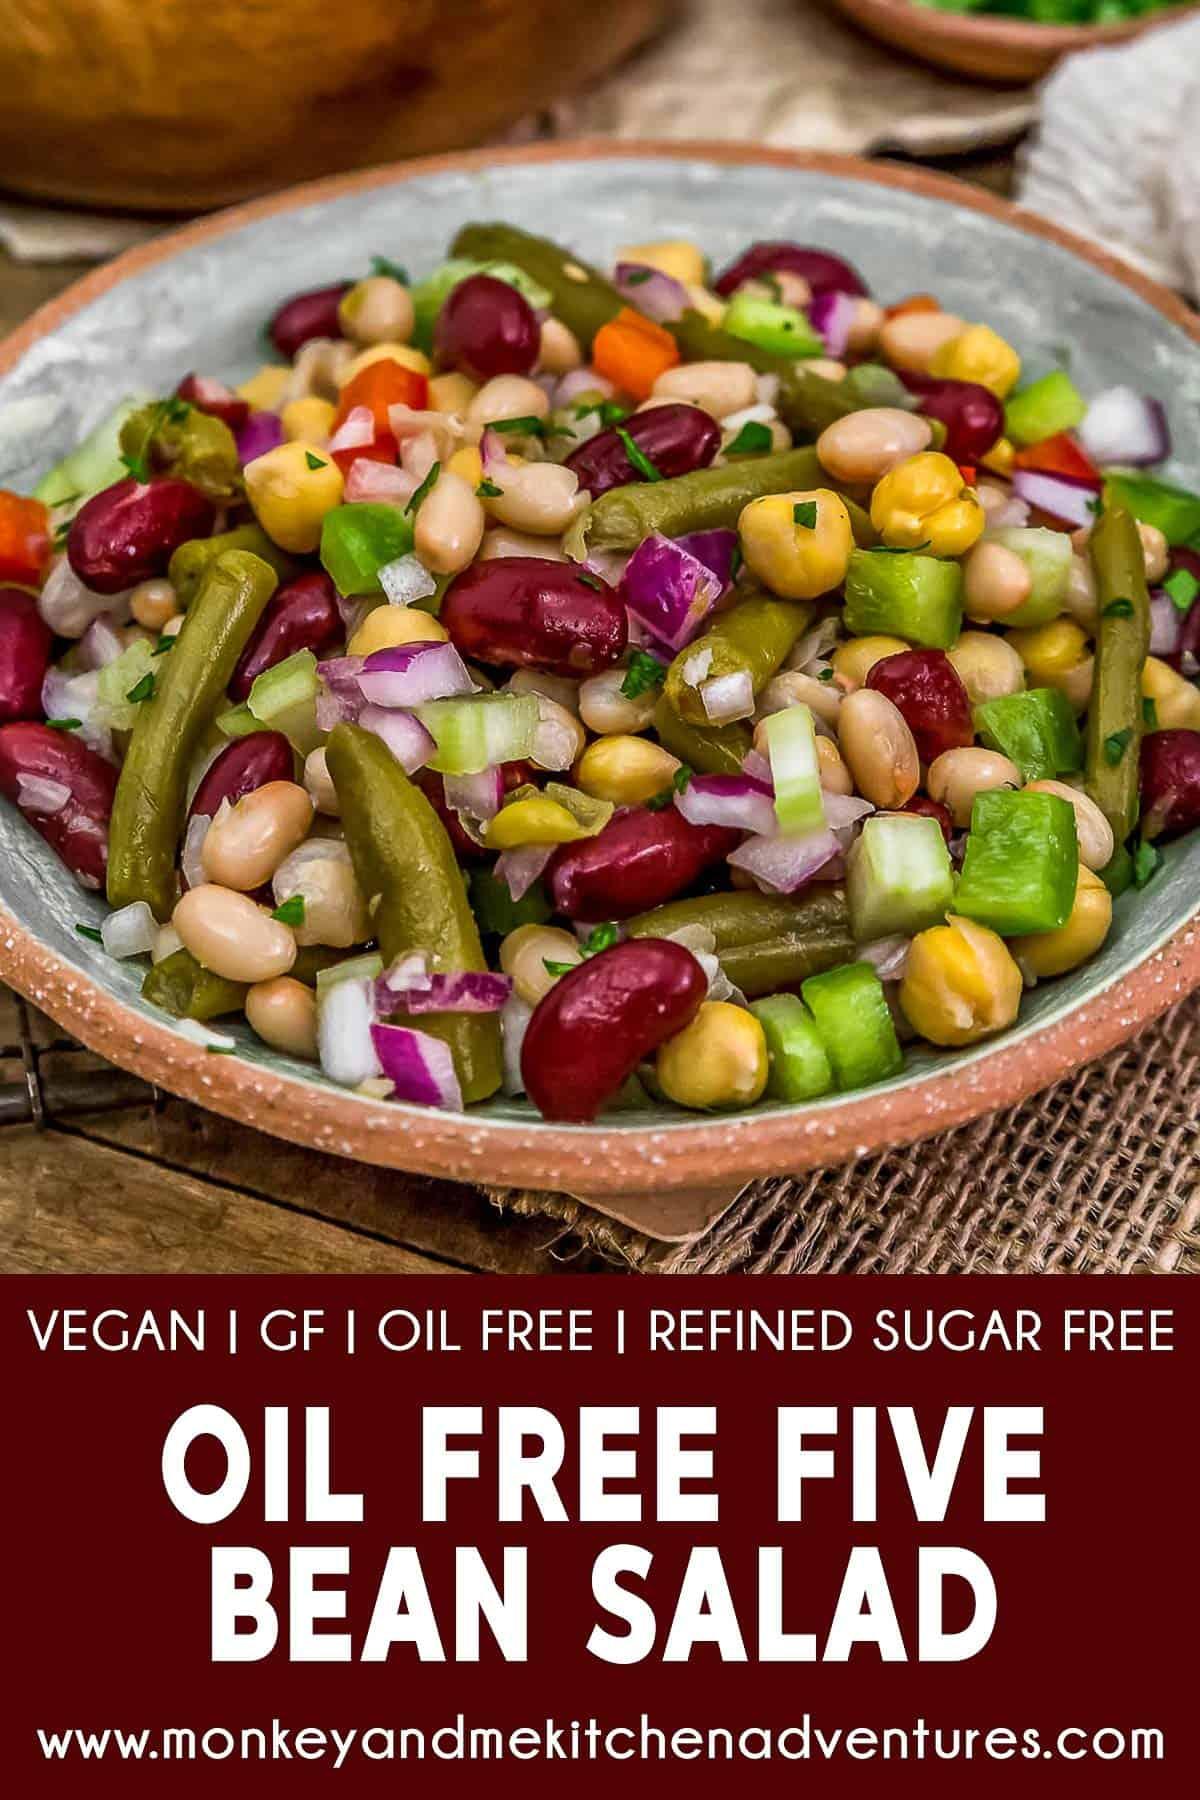 Oil Free Five Bean Salad with text description